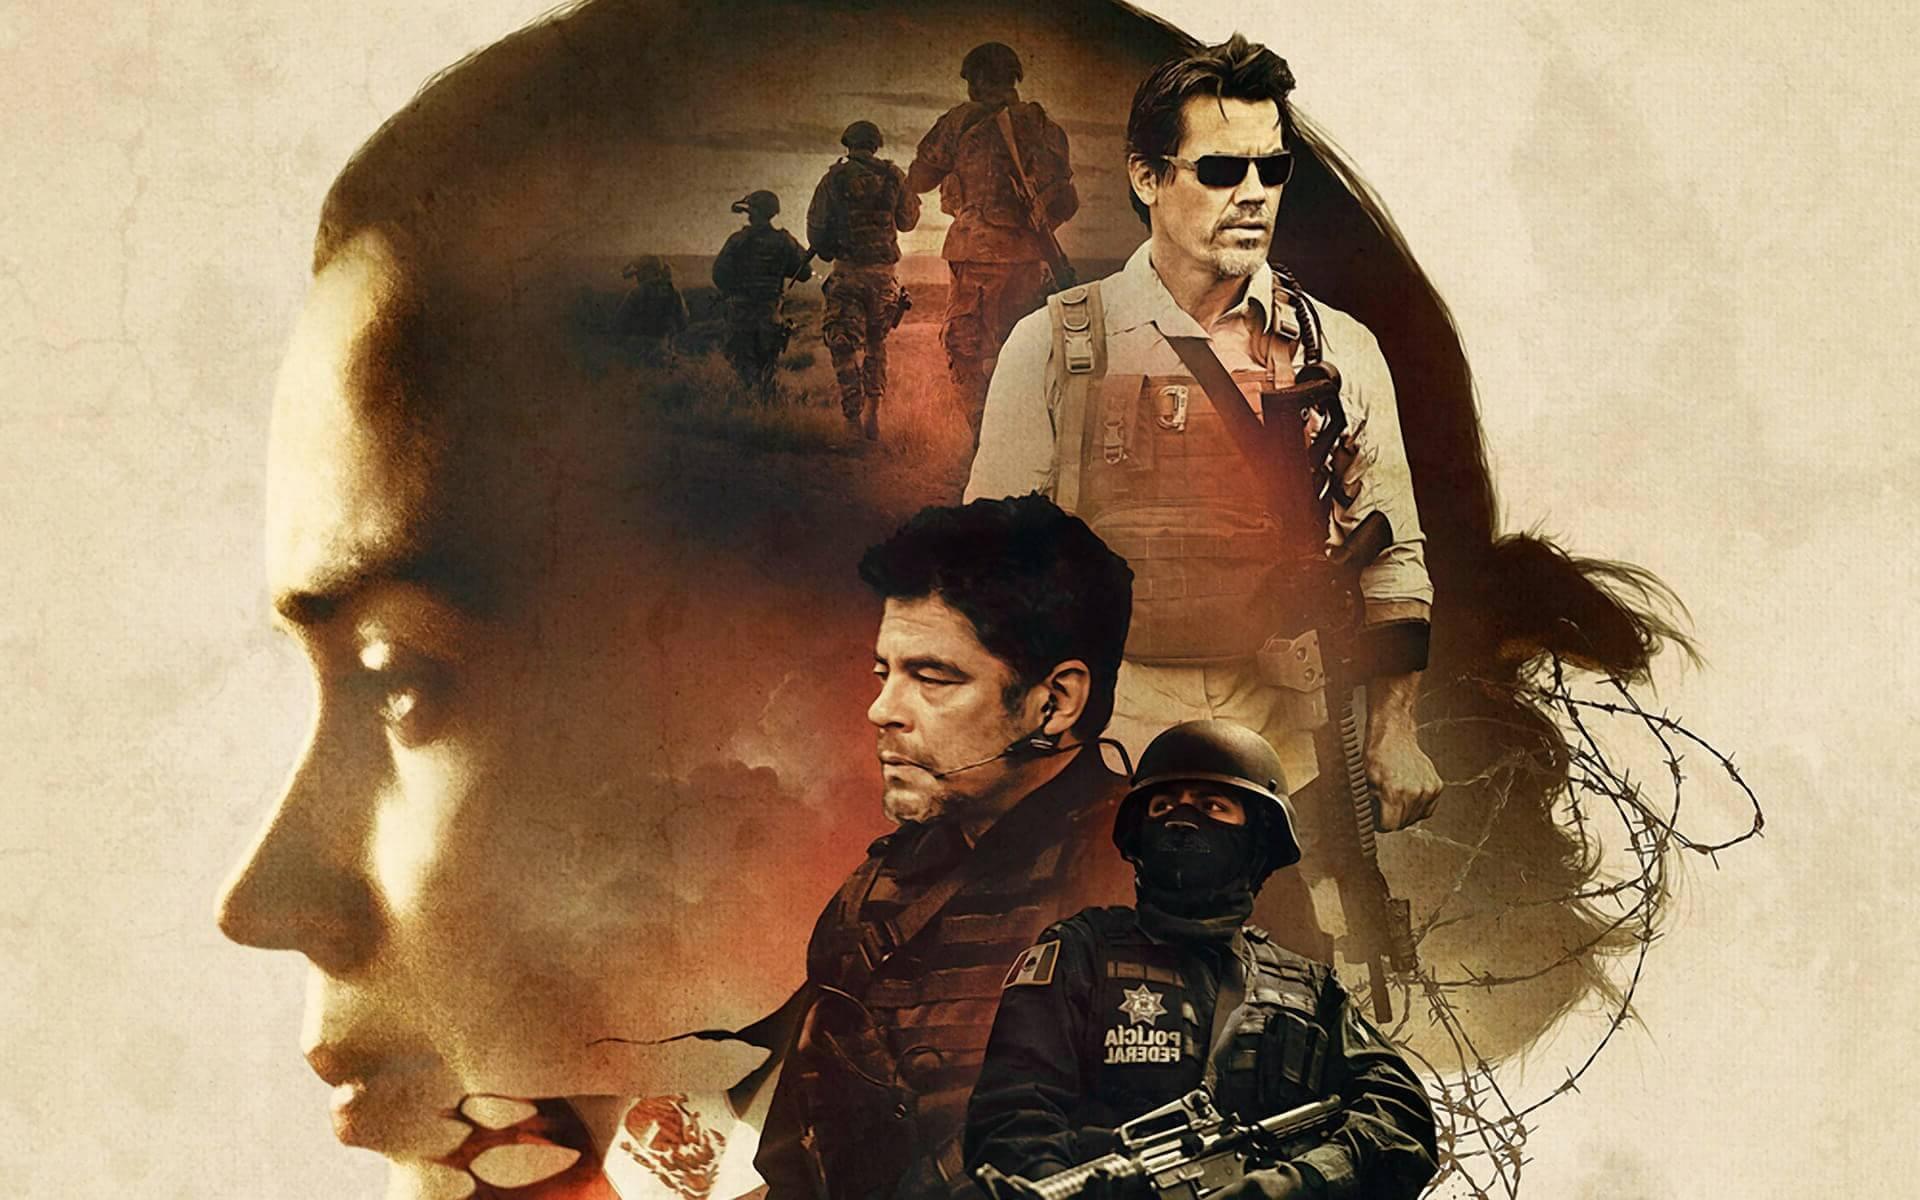 Sicario Movie Poster Hd - HD Wallpaper